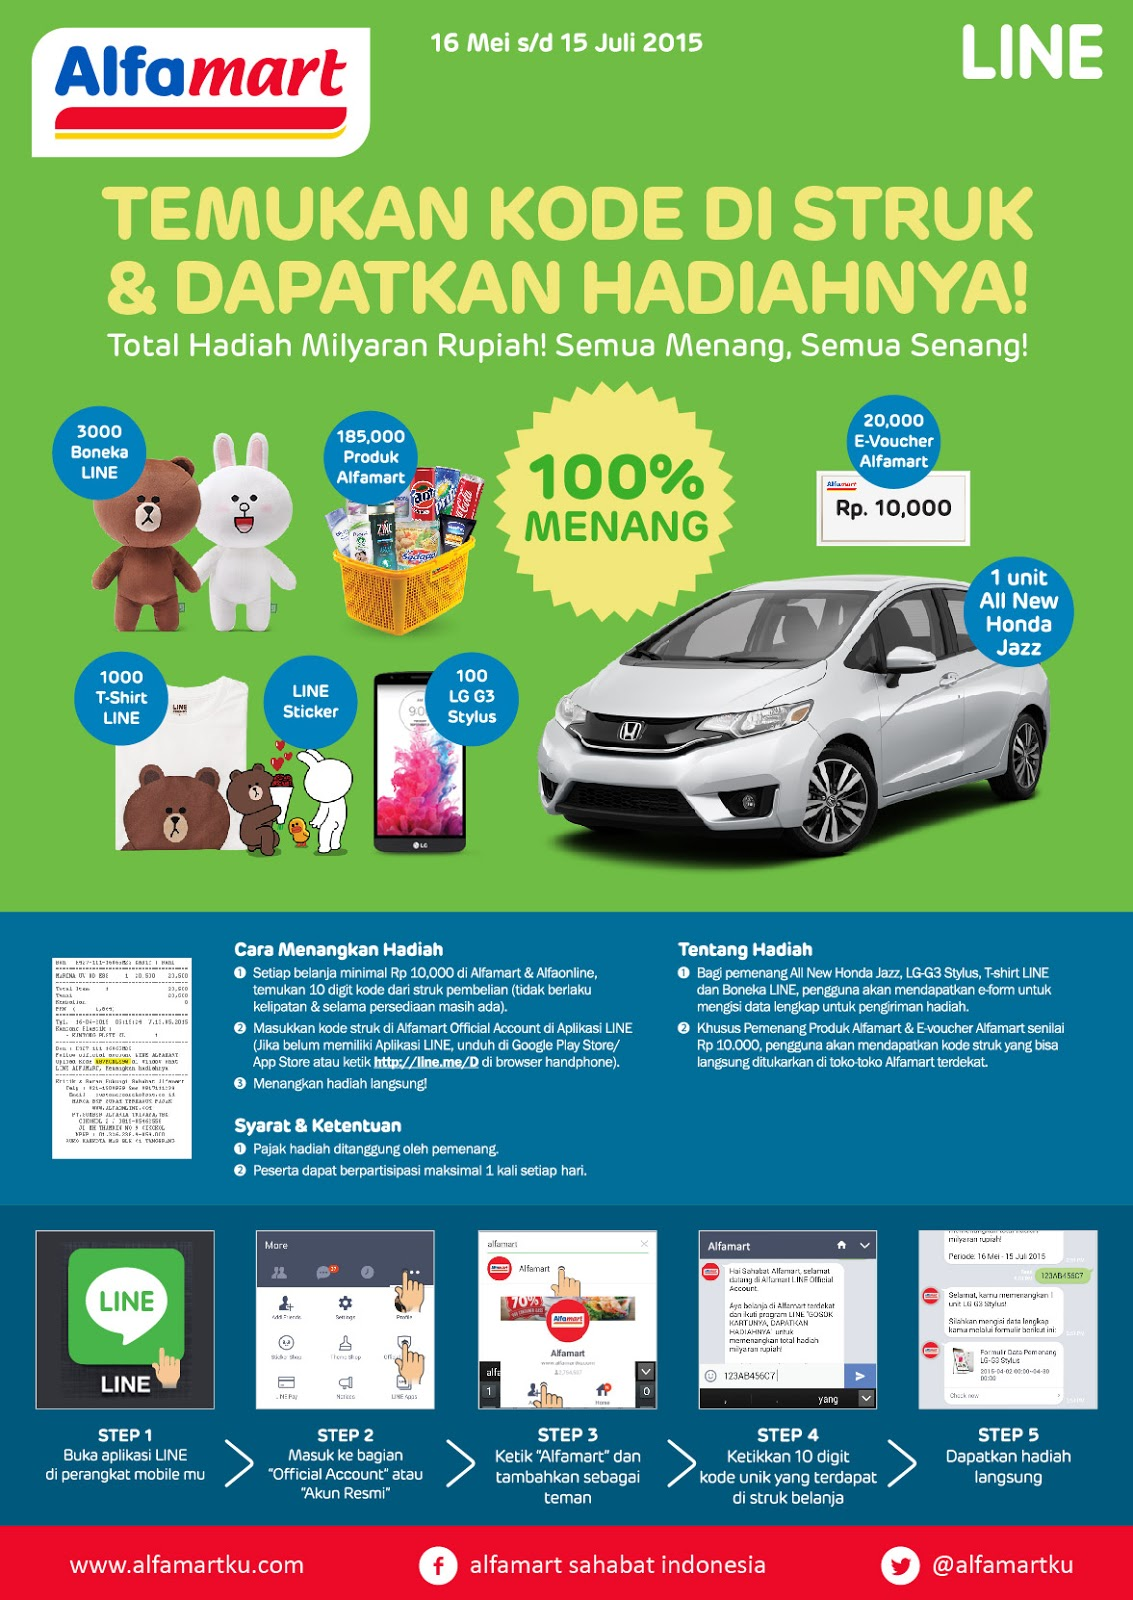 Katalog Promo Daftar Harga Diskon Alfamart Terbaru Juli 2015 E Voucher 1 Juta